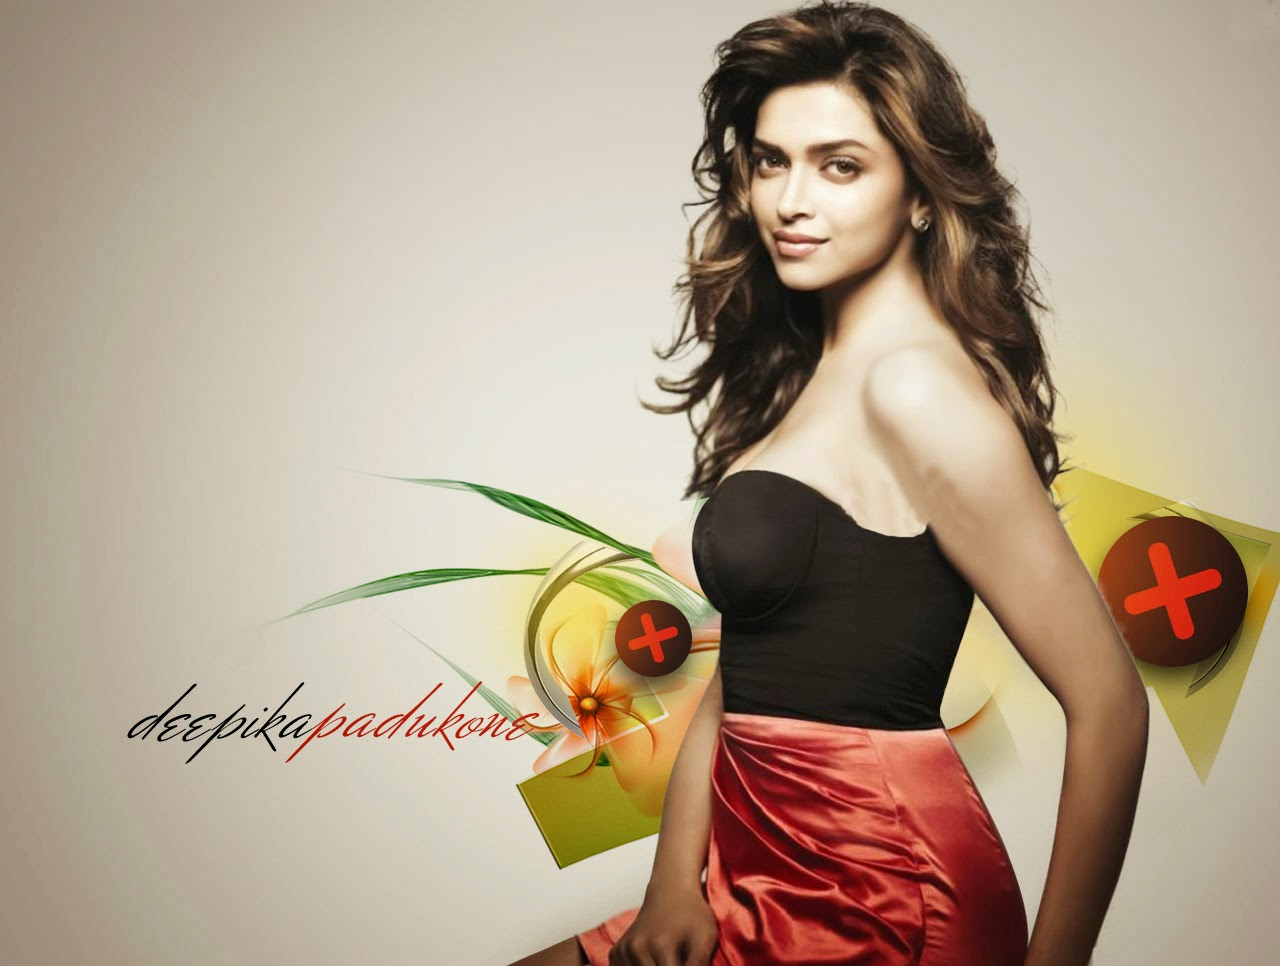 Deepika From Padmavat Hd Wallpaper: Global Pictures Gallery: Deepika Padukone Full HD Wallpapers